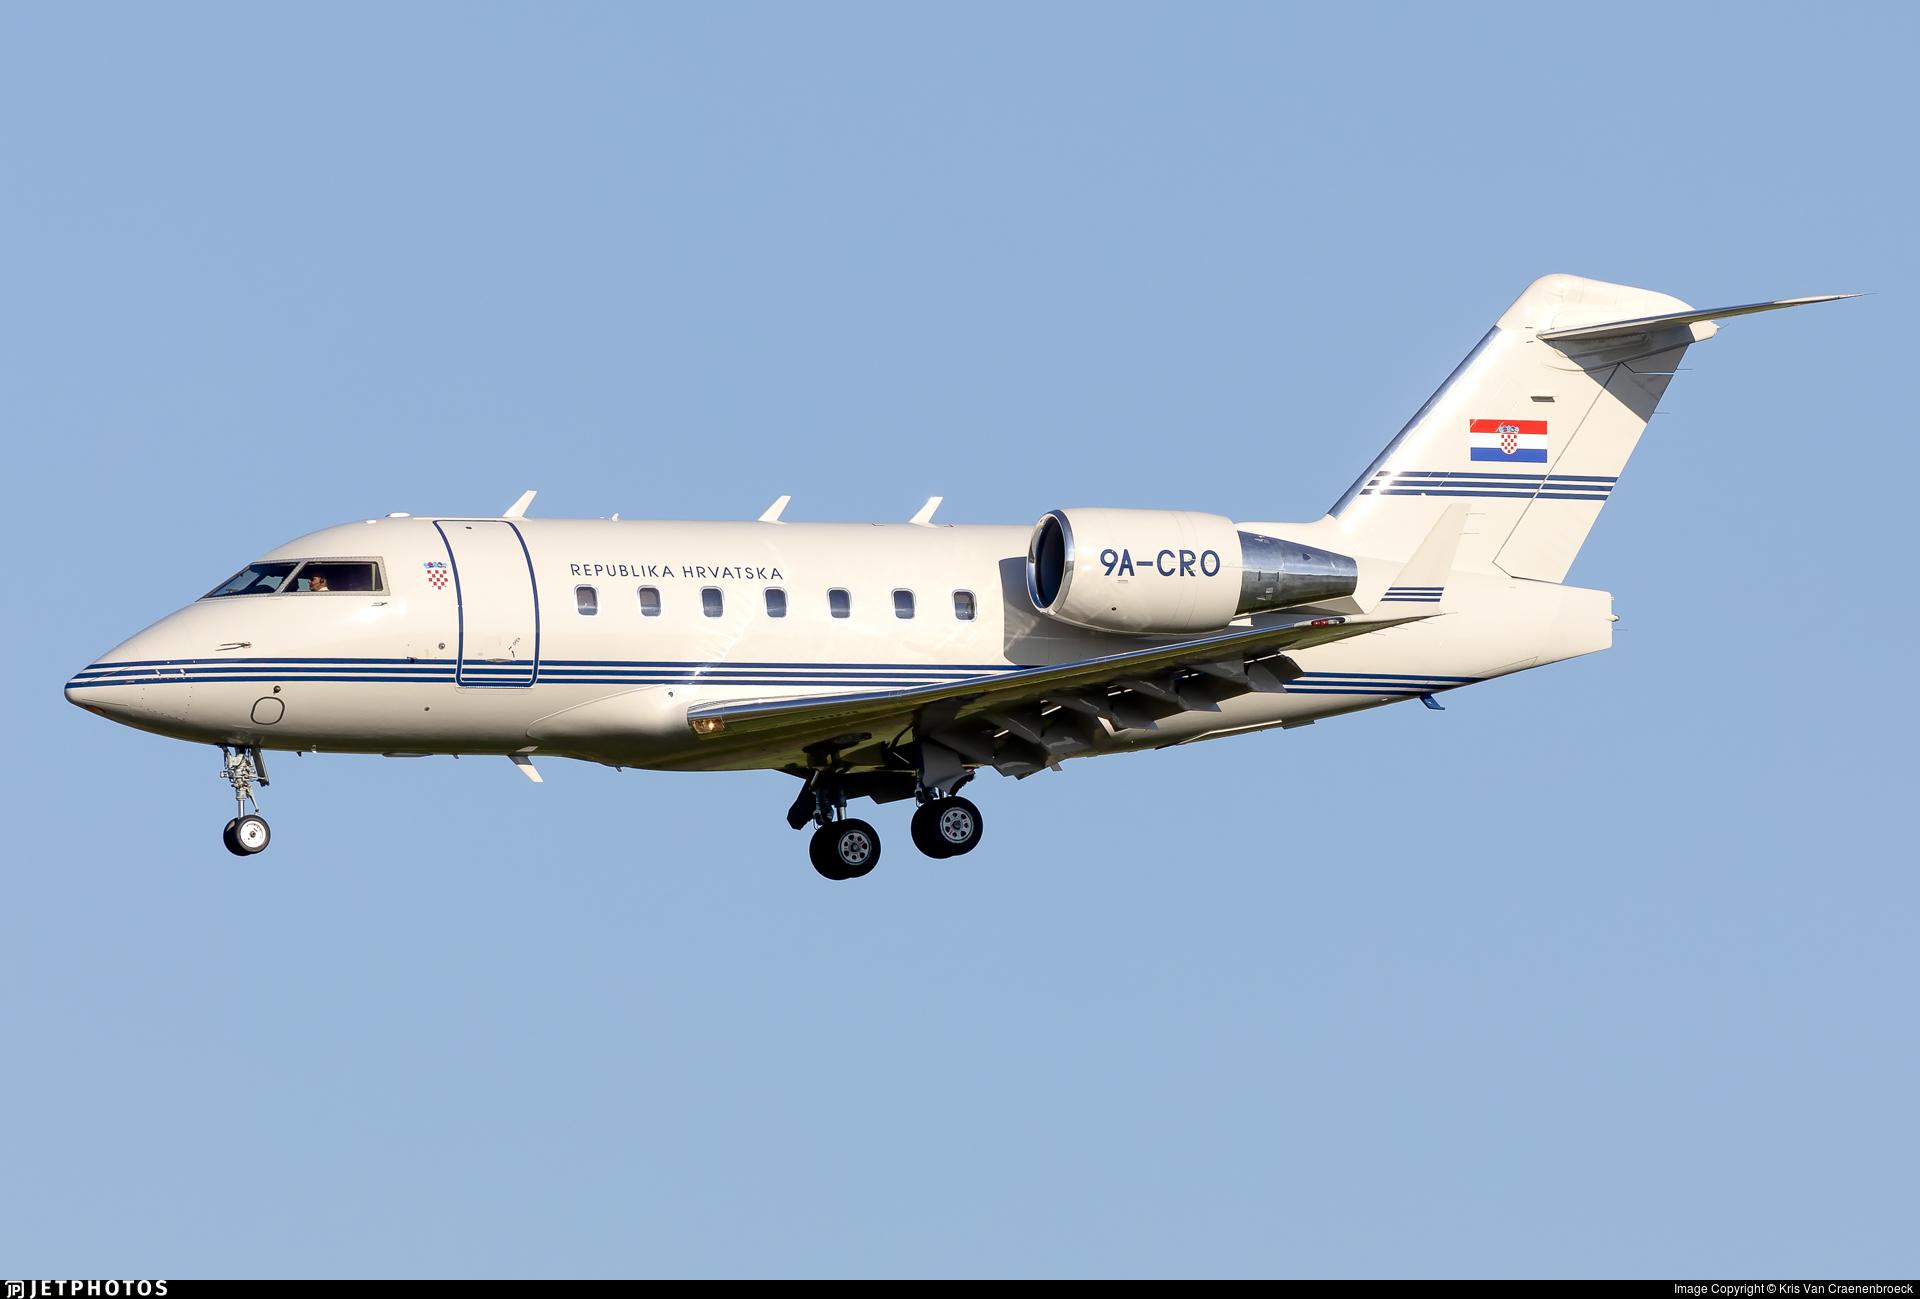 9A-CRO - Bombardier CL-600-2B16 Challenger 604 - Croatia - Government